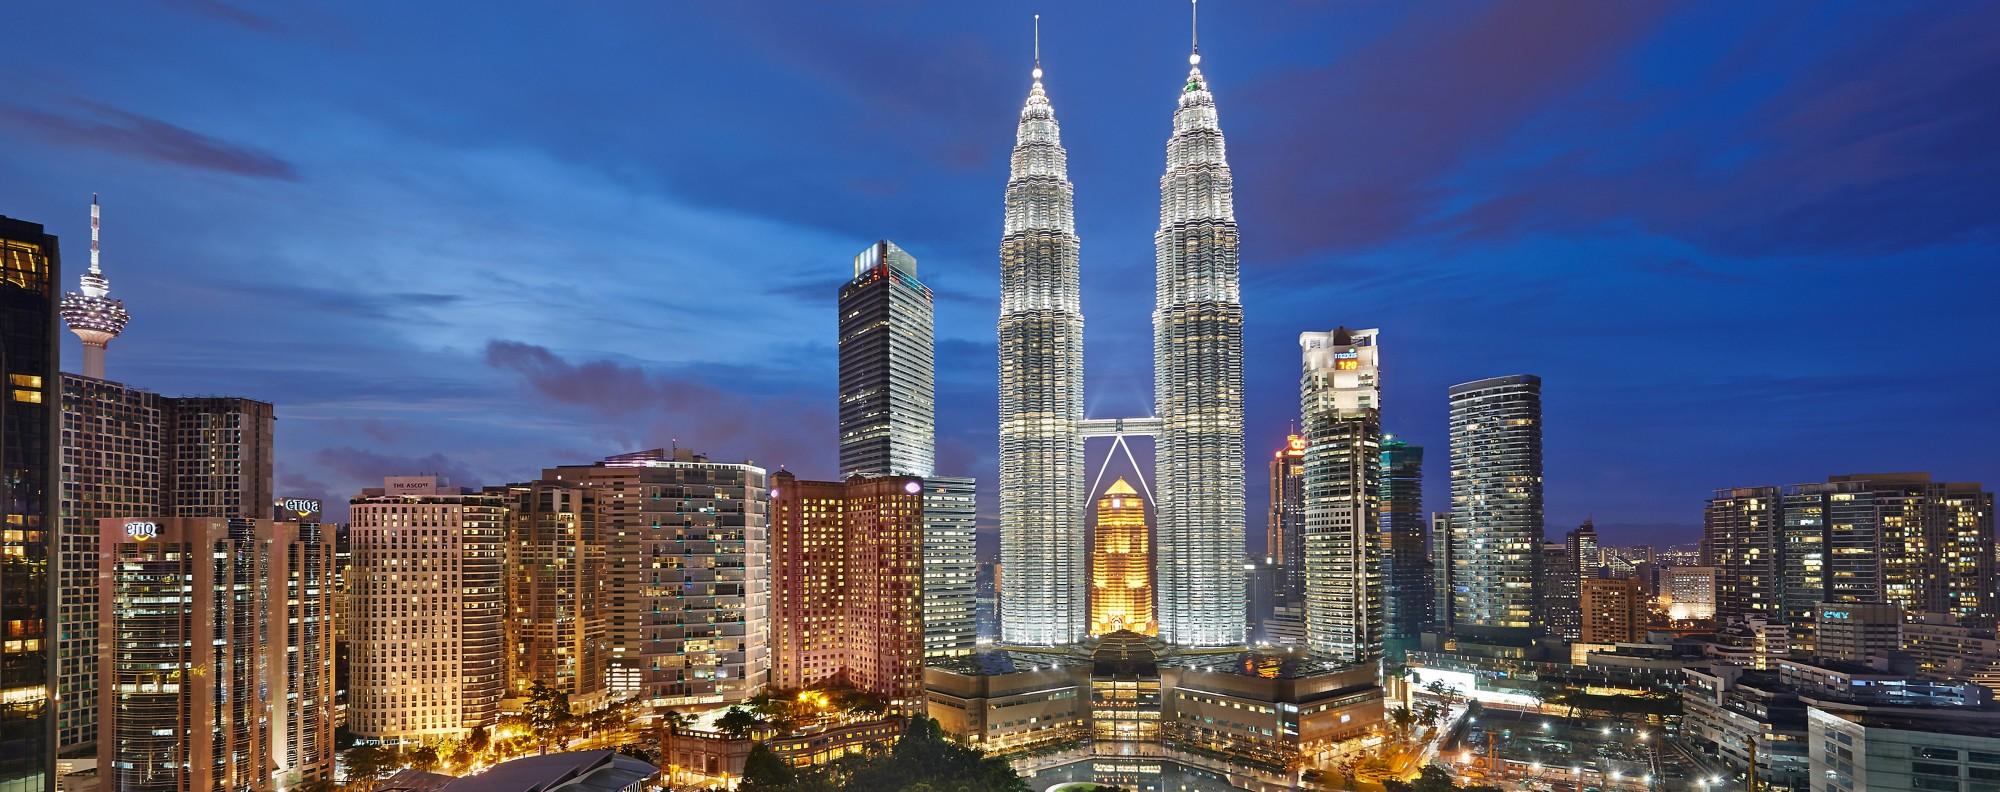 The Kuala Lumpur skyline. File photo